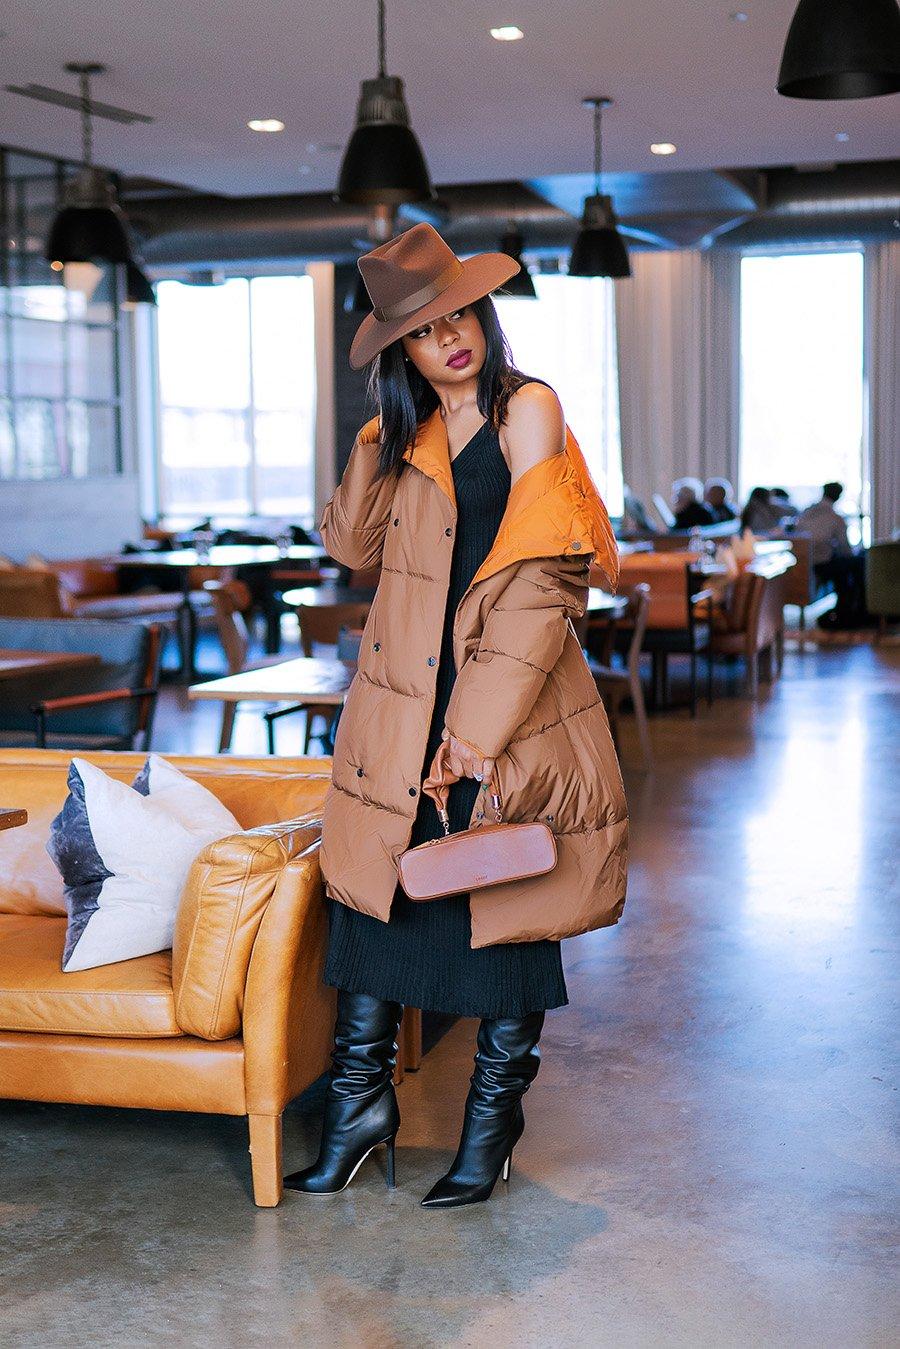 stella-adewunmi-of-jadore-fashion-blog-shares-sweater-dress-puffer-coat